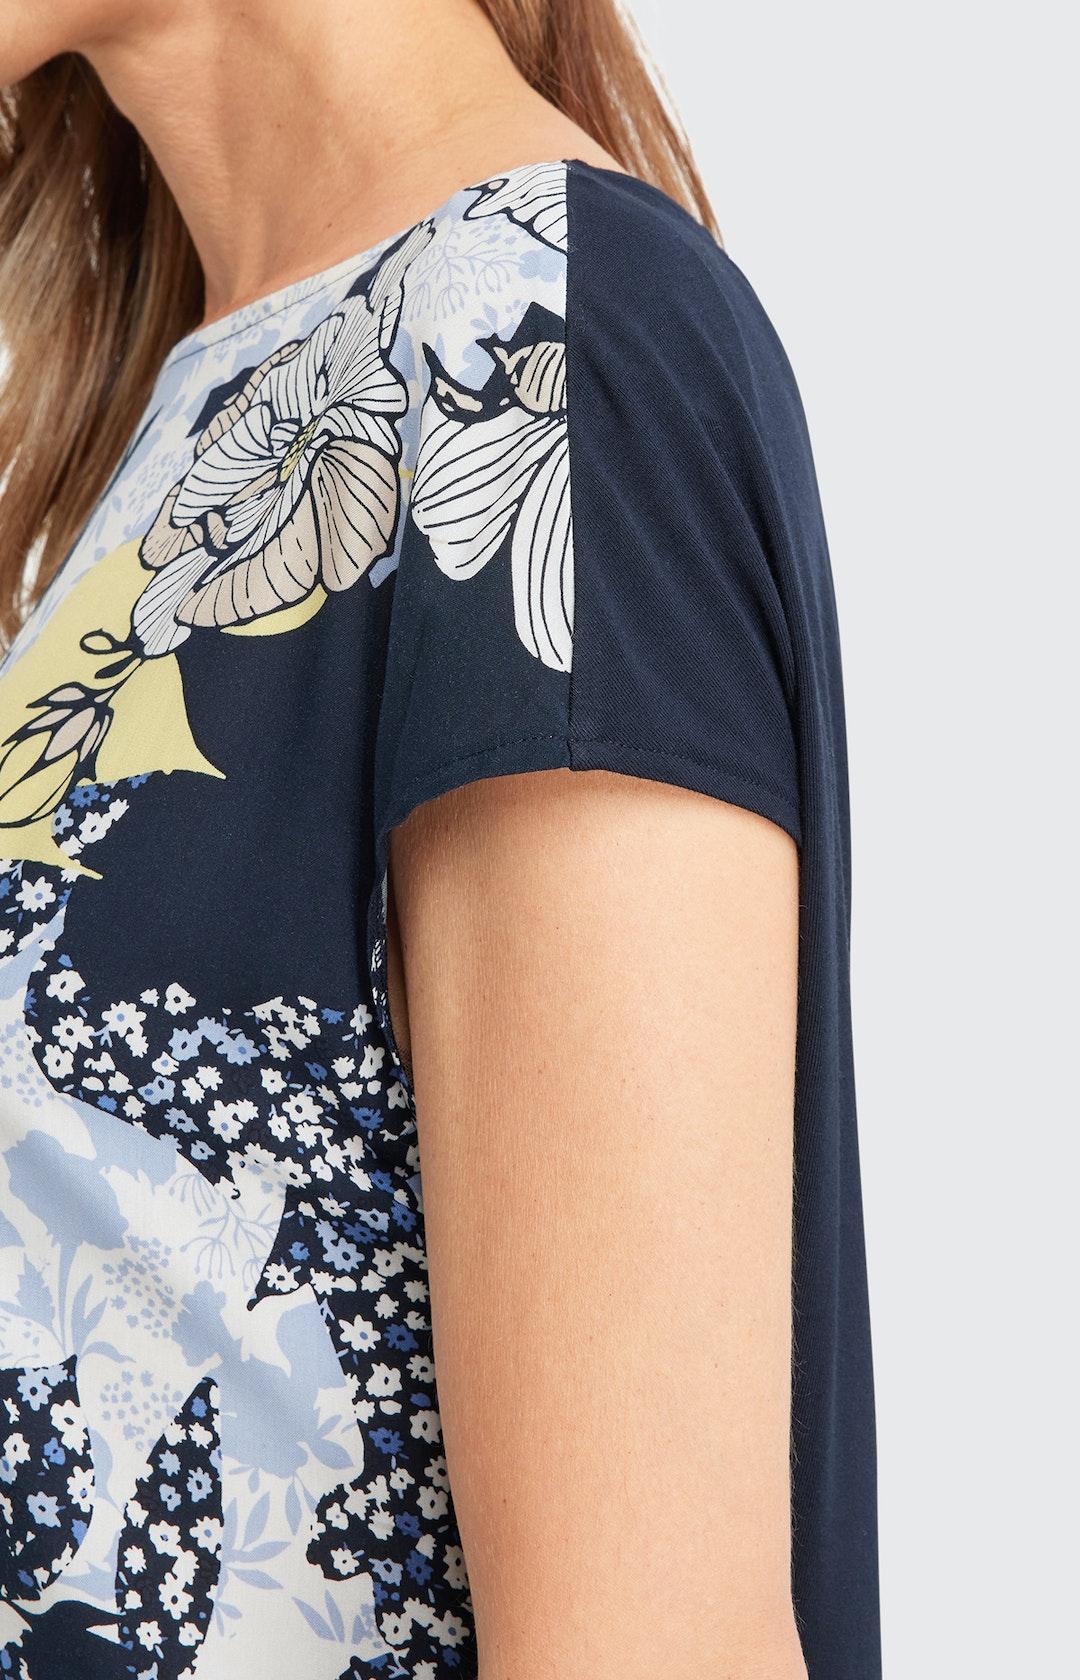 T-Shirt mit Allover-Muster in Blau